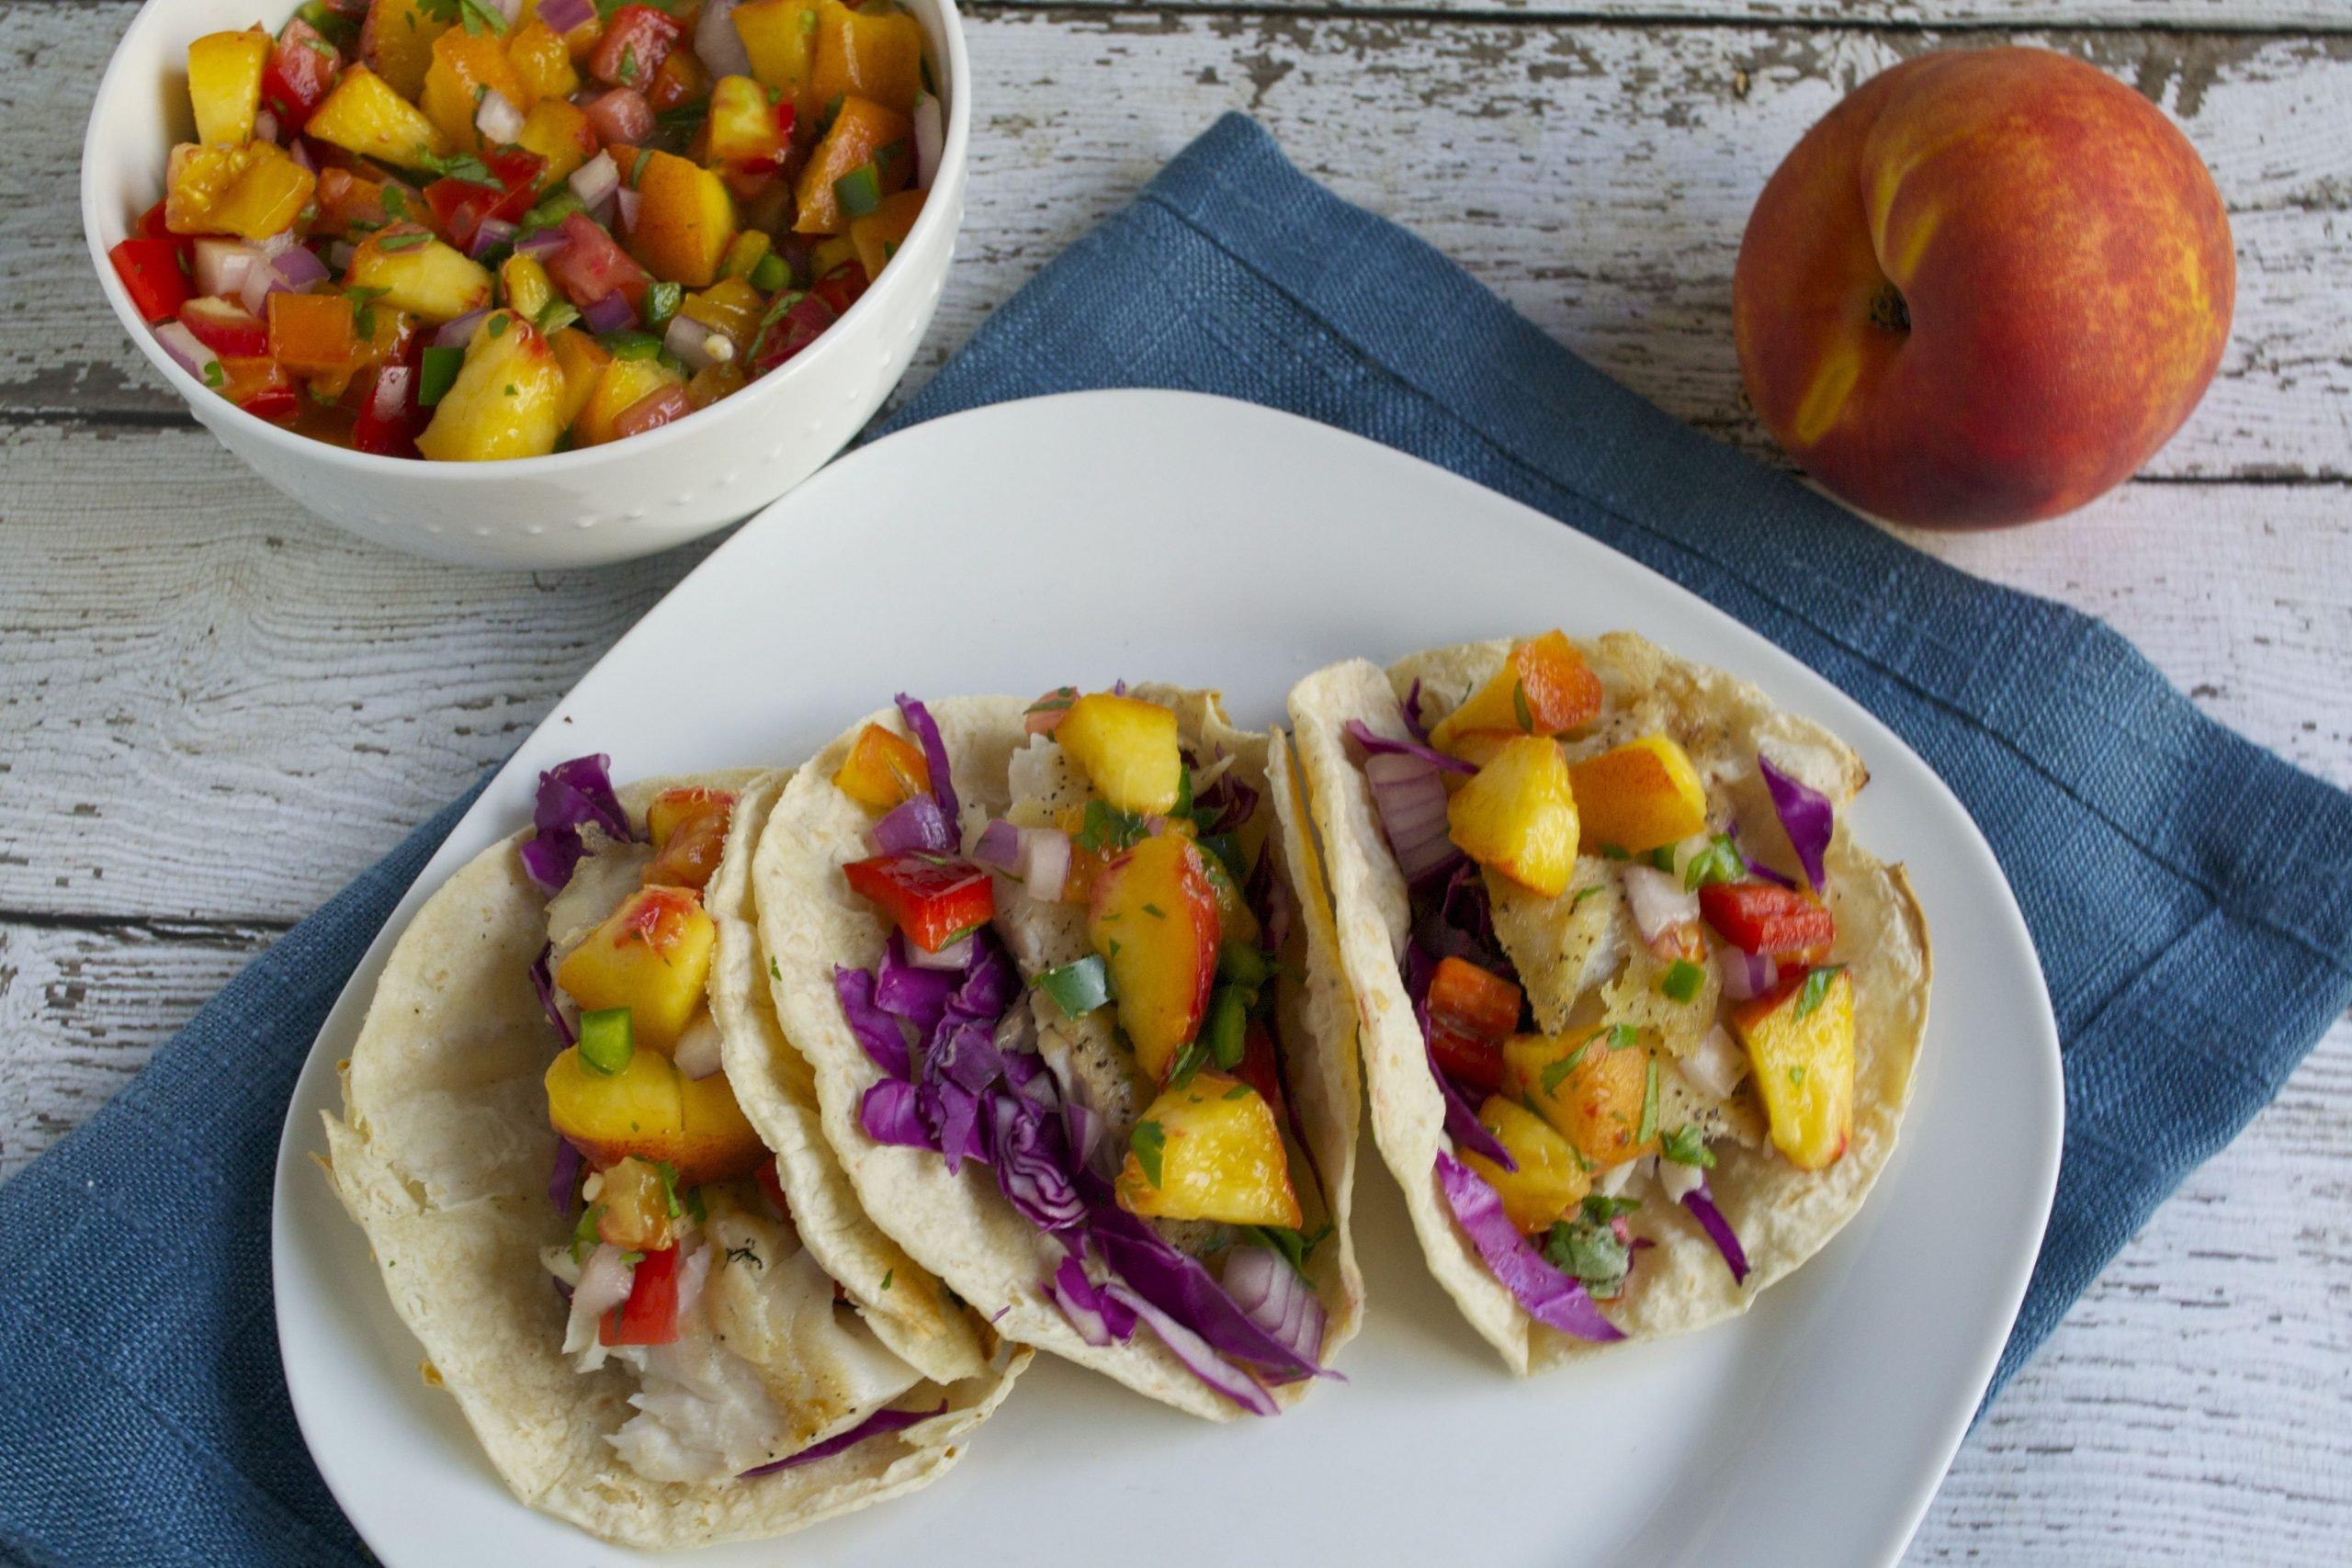 Tilapia Fish Tacos with Peach Salsa (GF, DF) - A Dash of Megnut